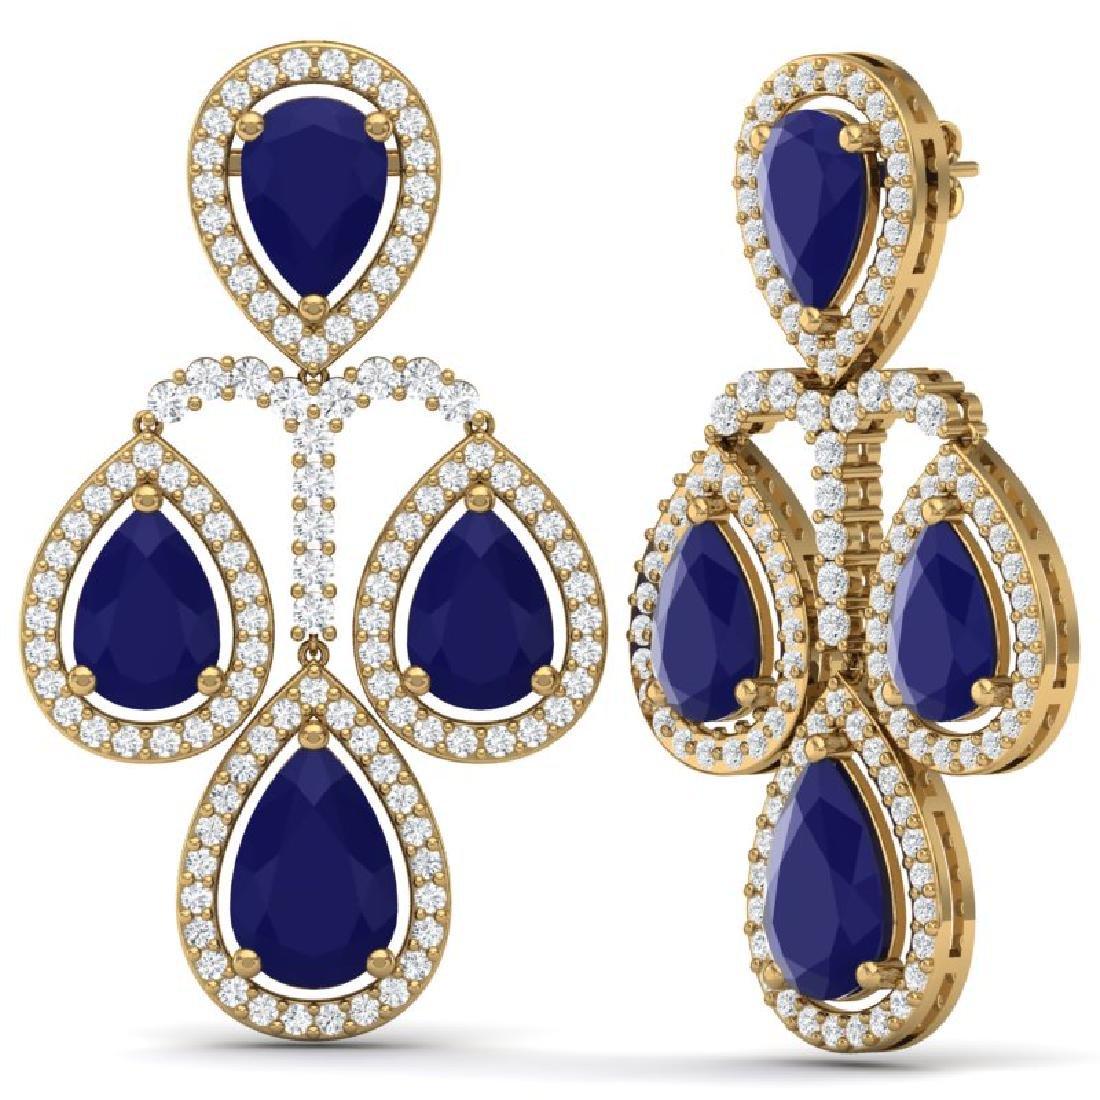 29.23 CTW Royalty Sapphire & VS Diamond Earrings 18K - 3